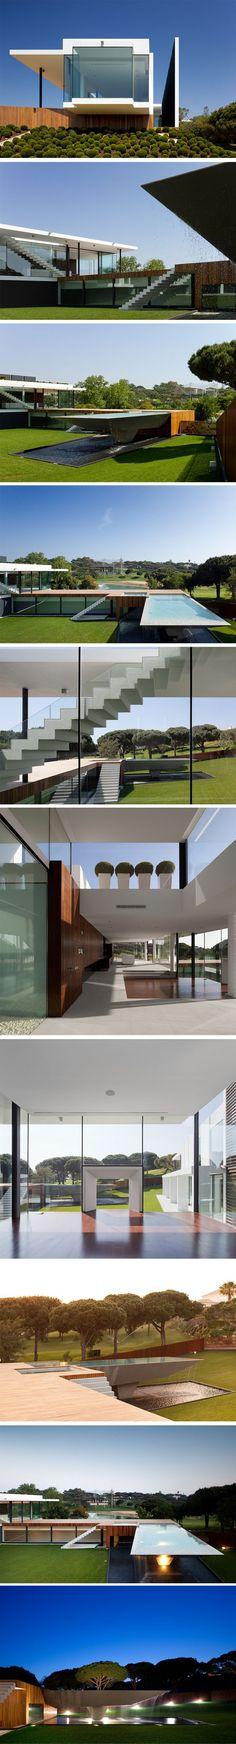 Casa Vale Do Lobo by Arqui+Arquitectura, Portugal: